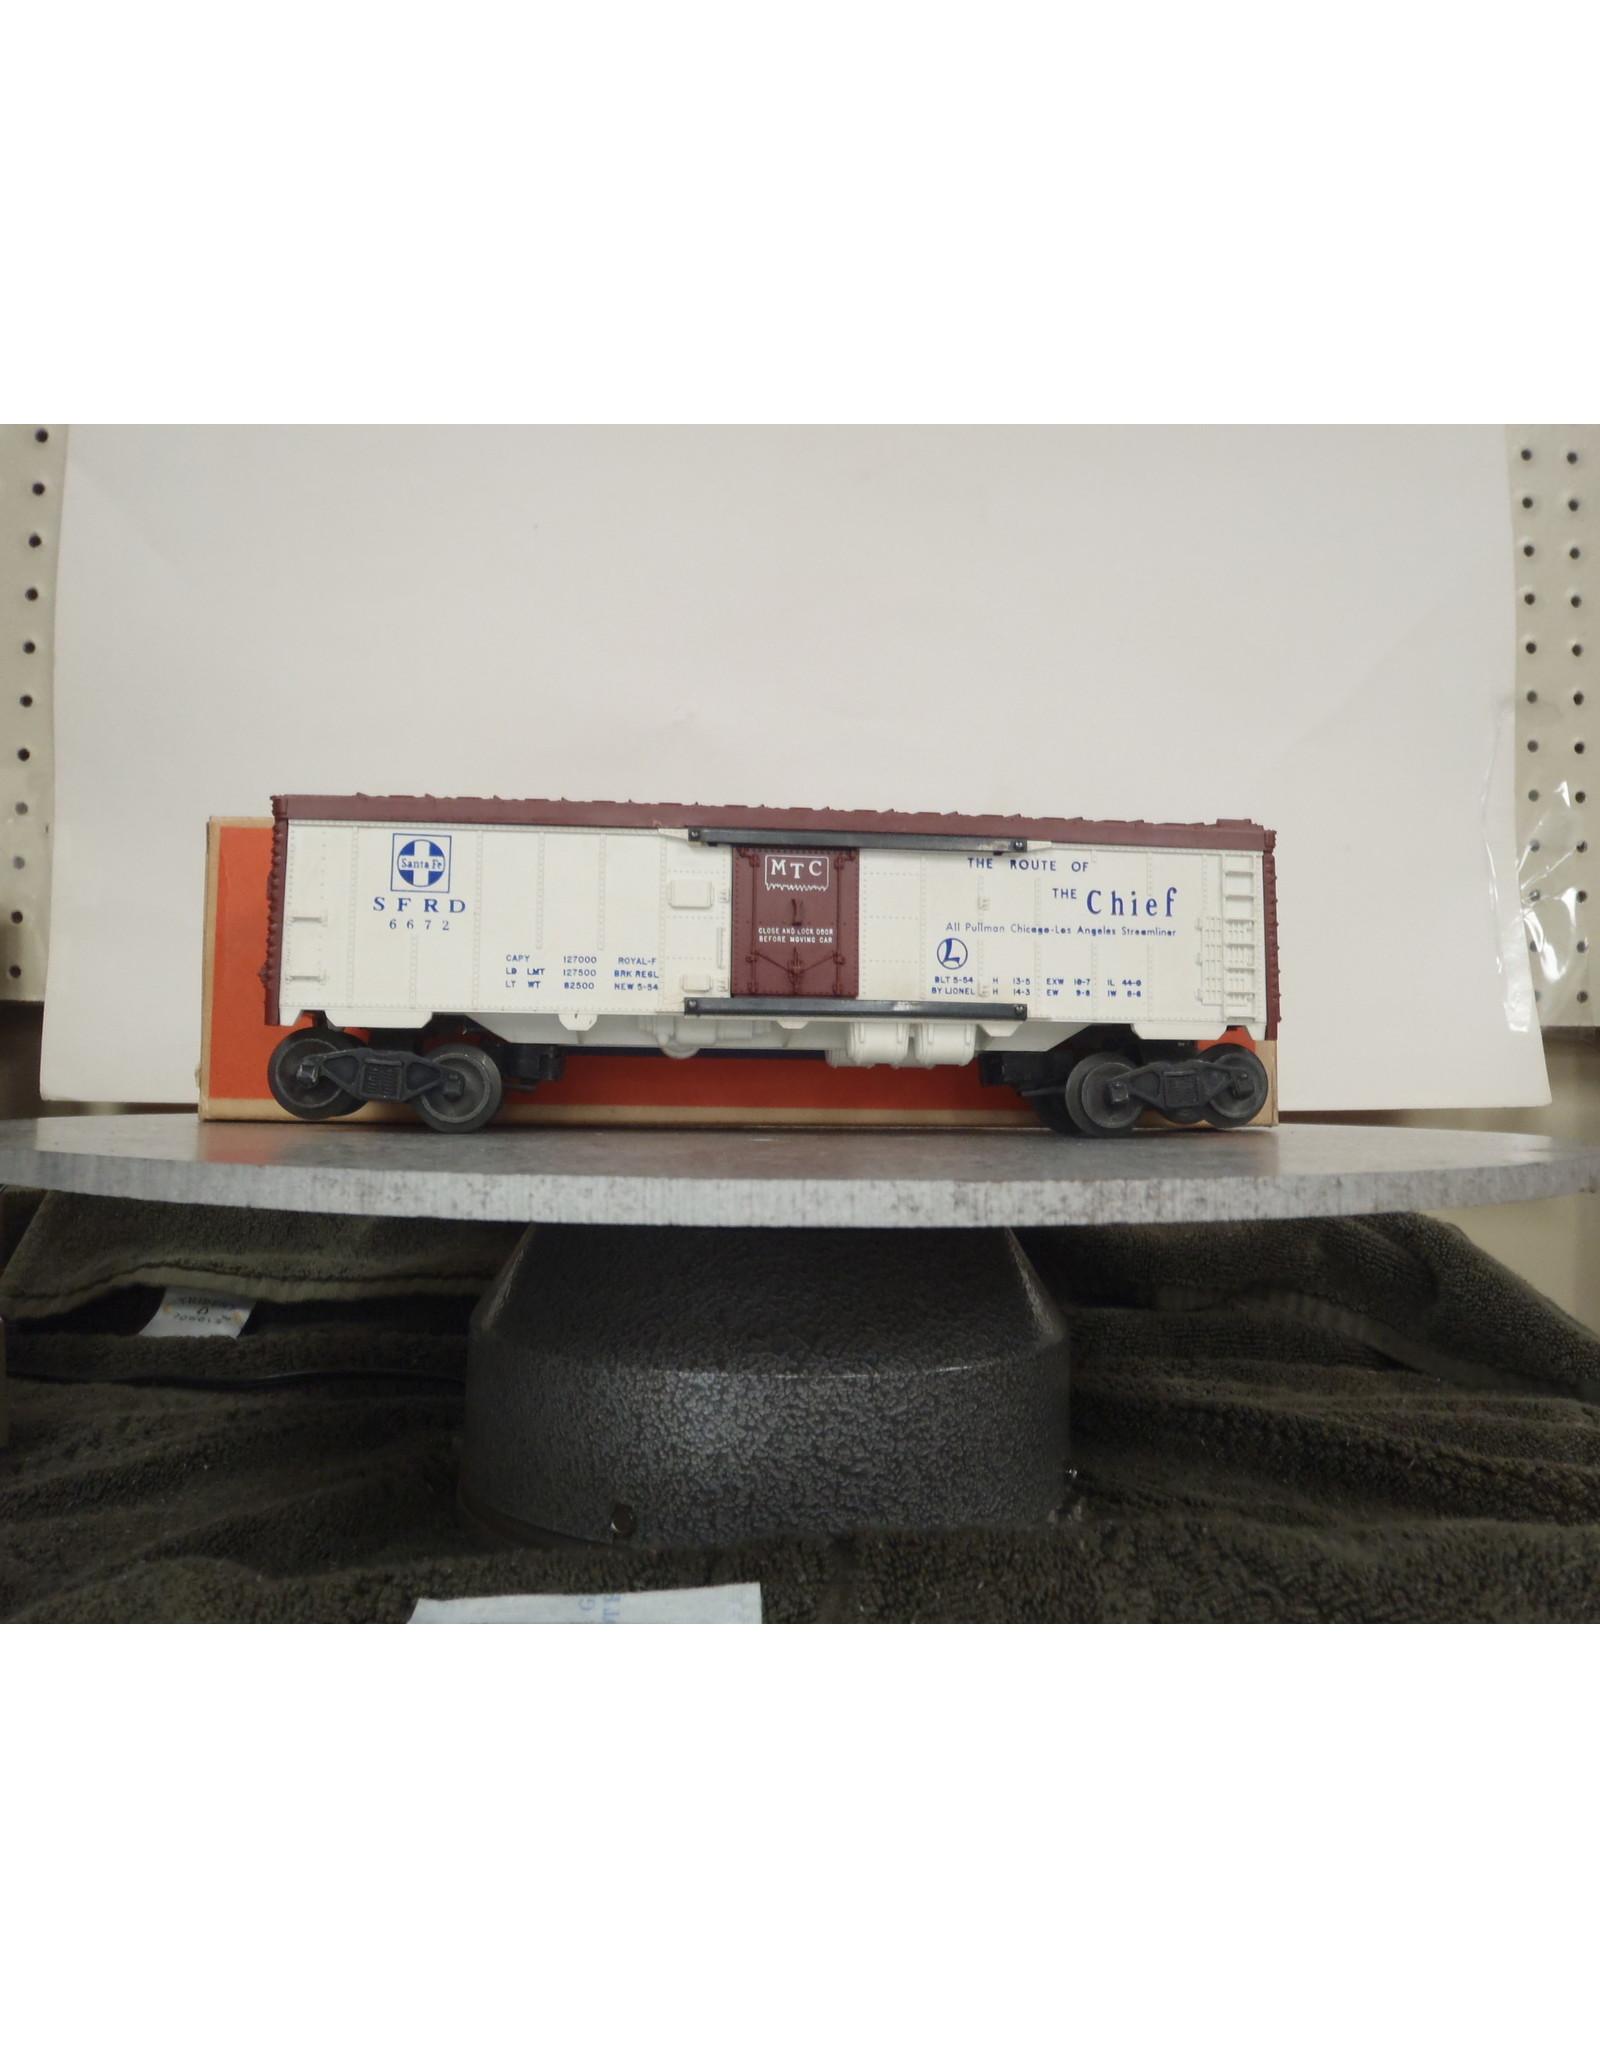 Lionel Refrigerator Car 6672